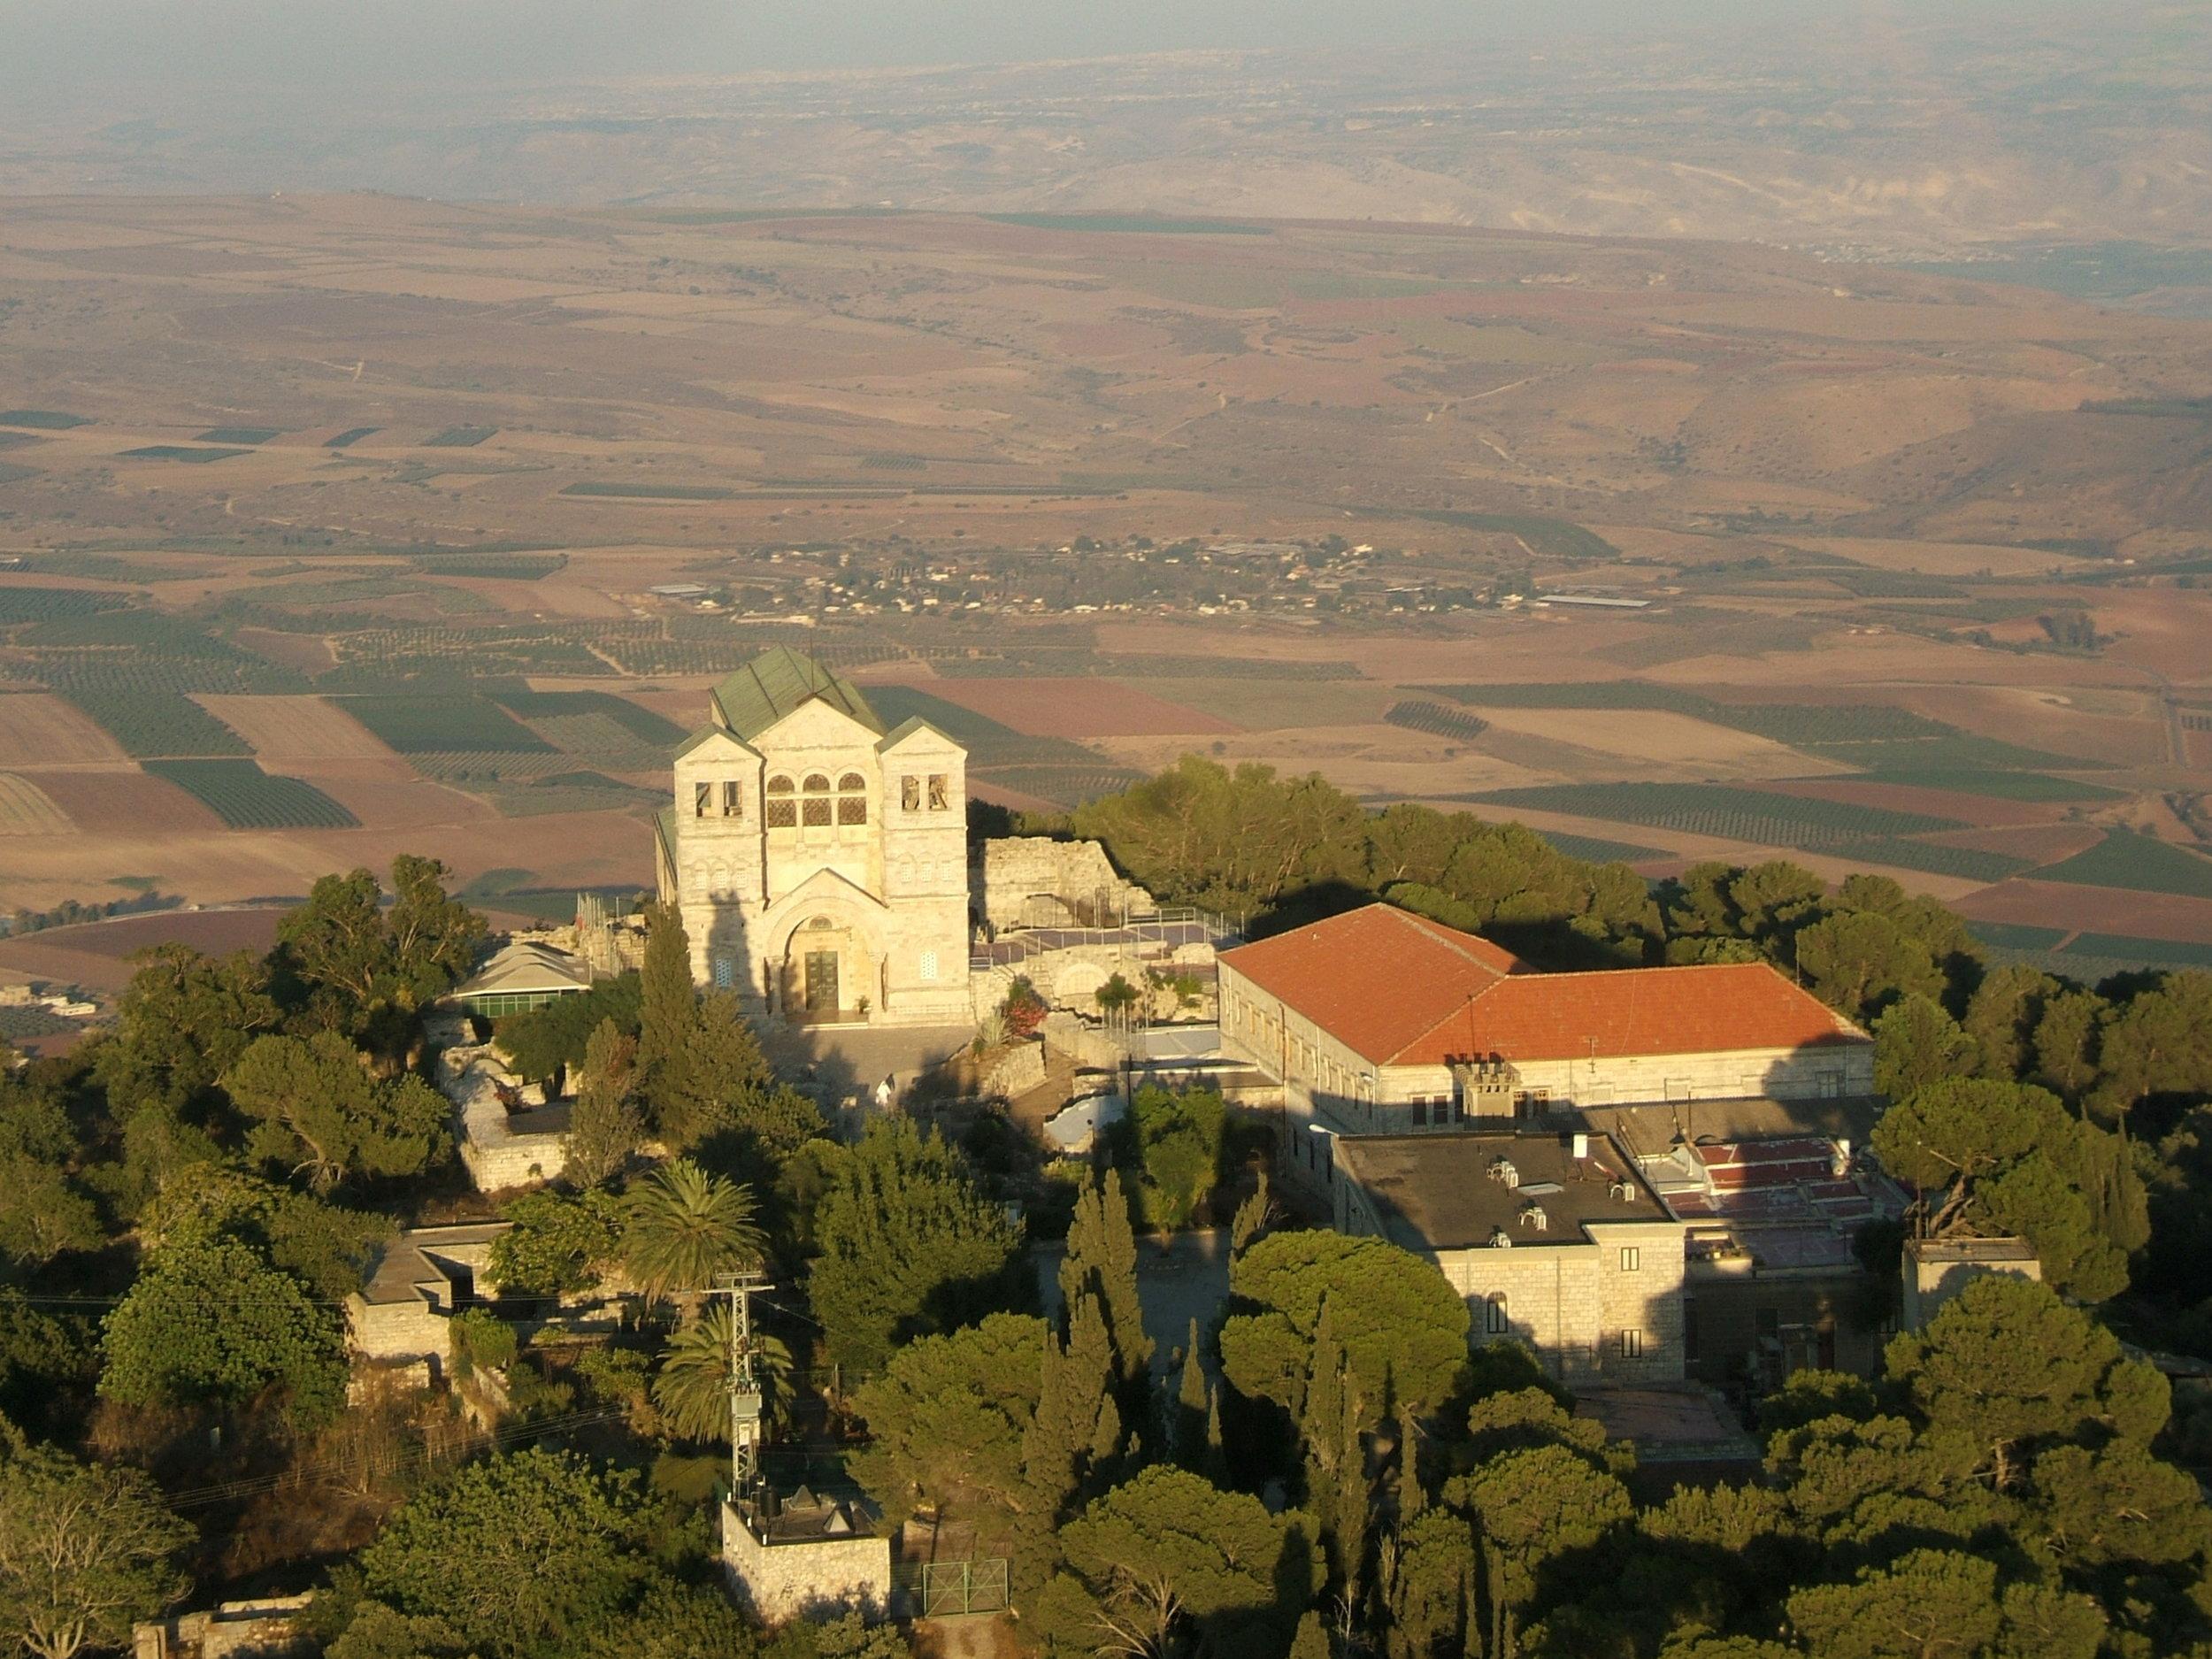 mount-tabor-holy-land-tours.jpg